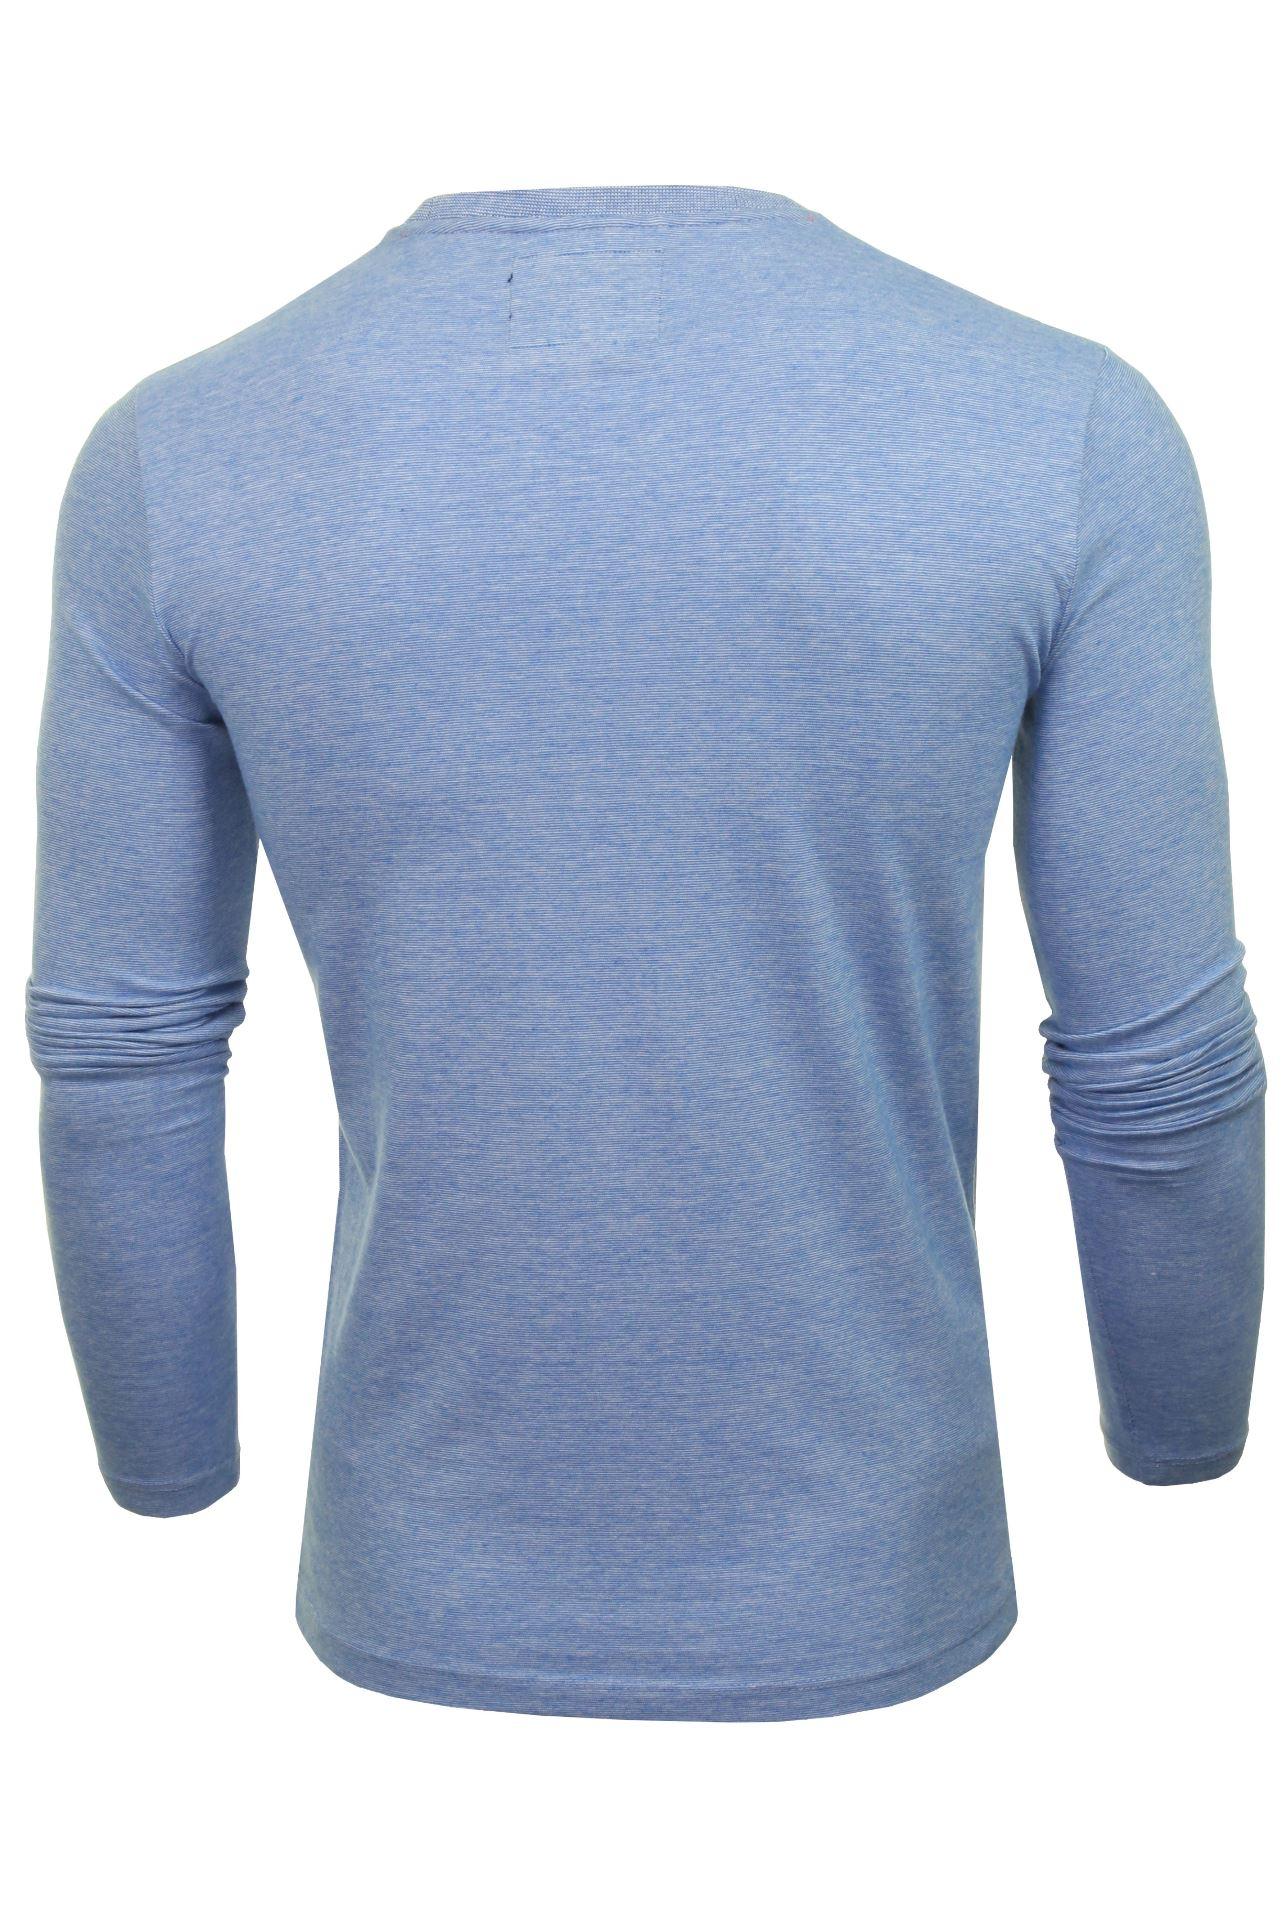 Superdry-039-Orange-Label-039-Long-Sleeved-T-Shirt thumbnail 11